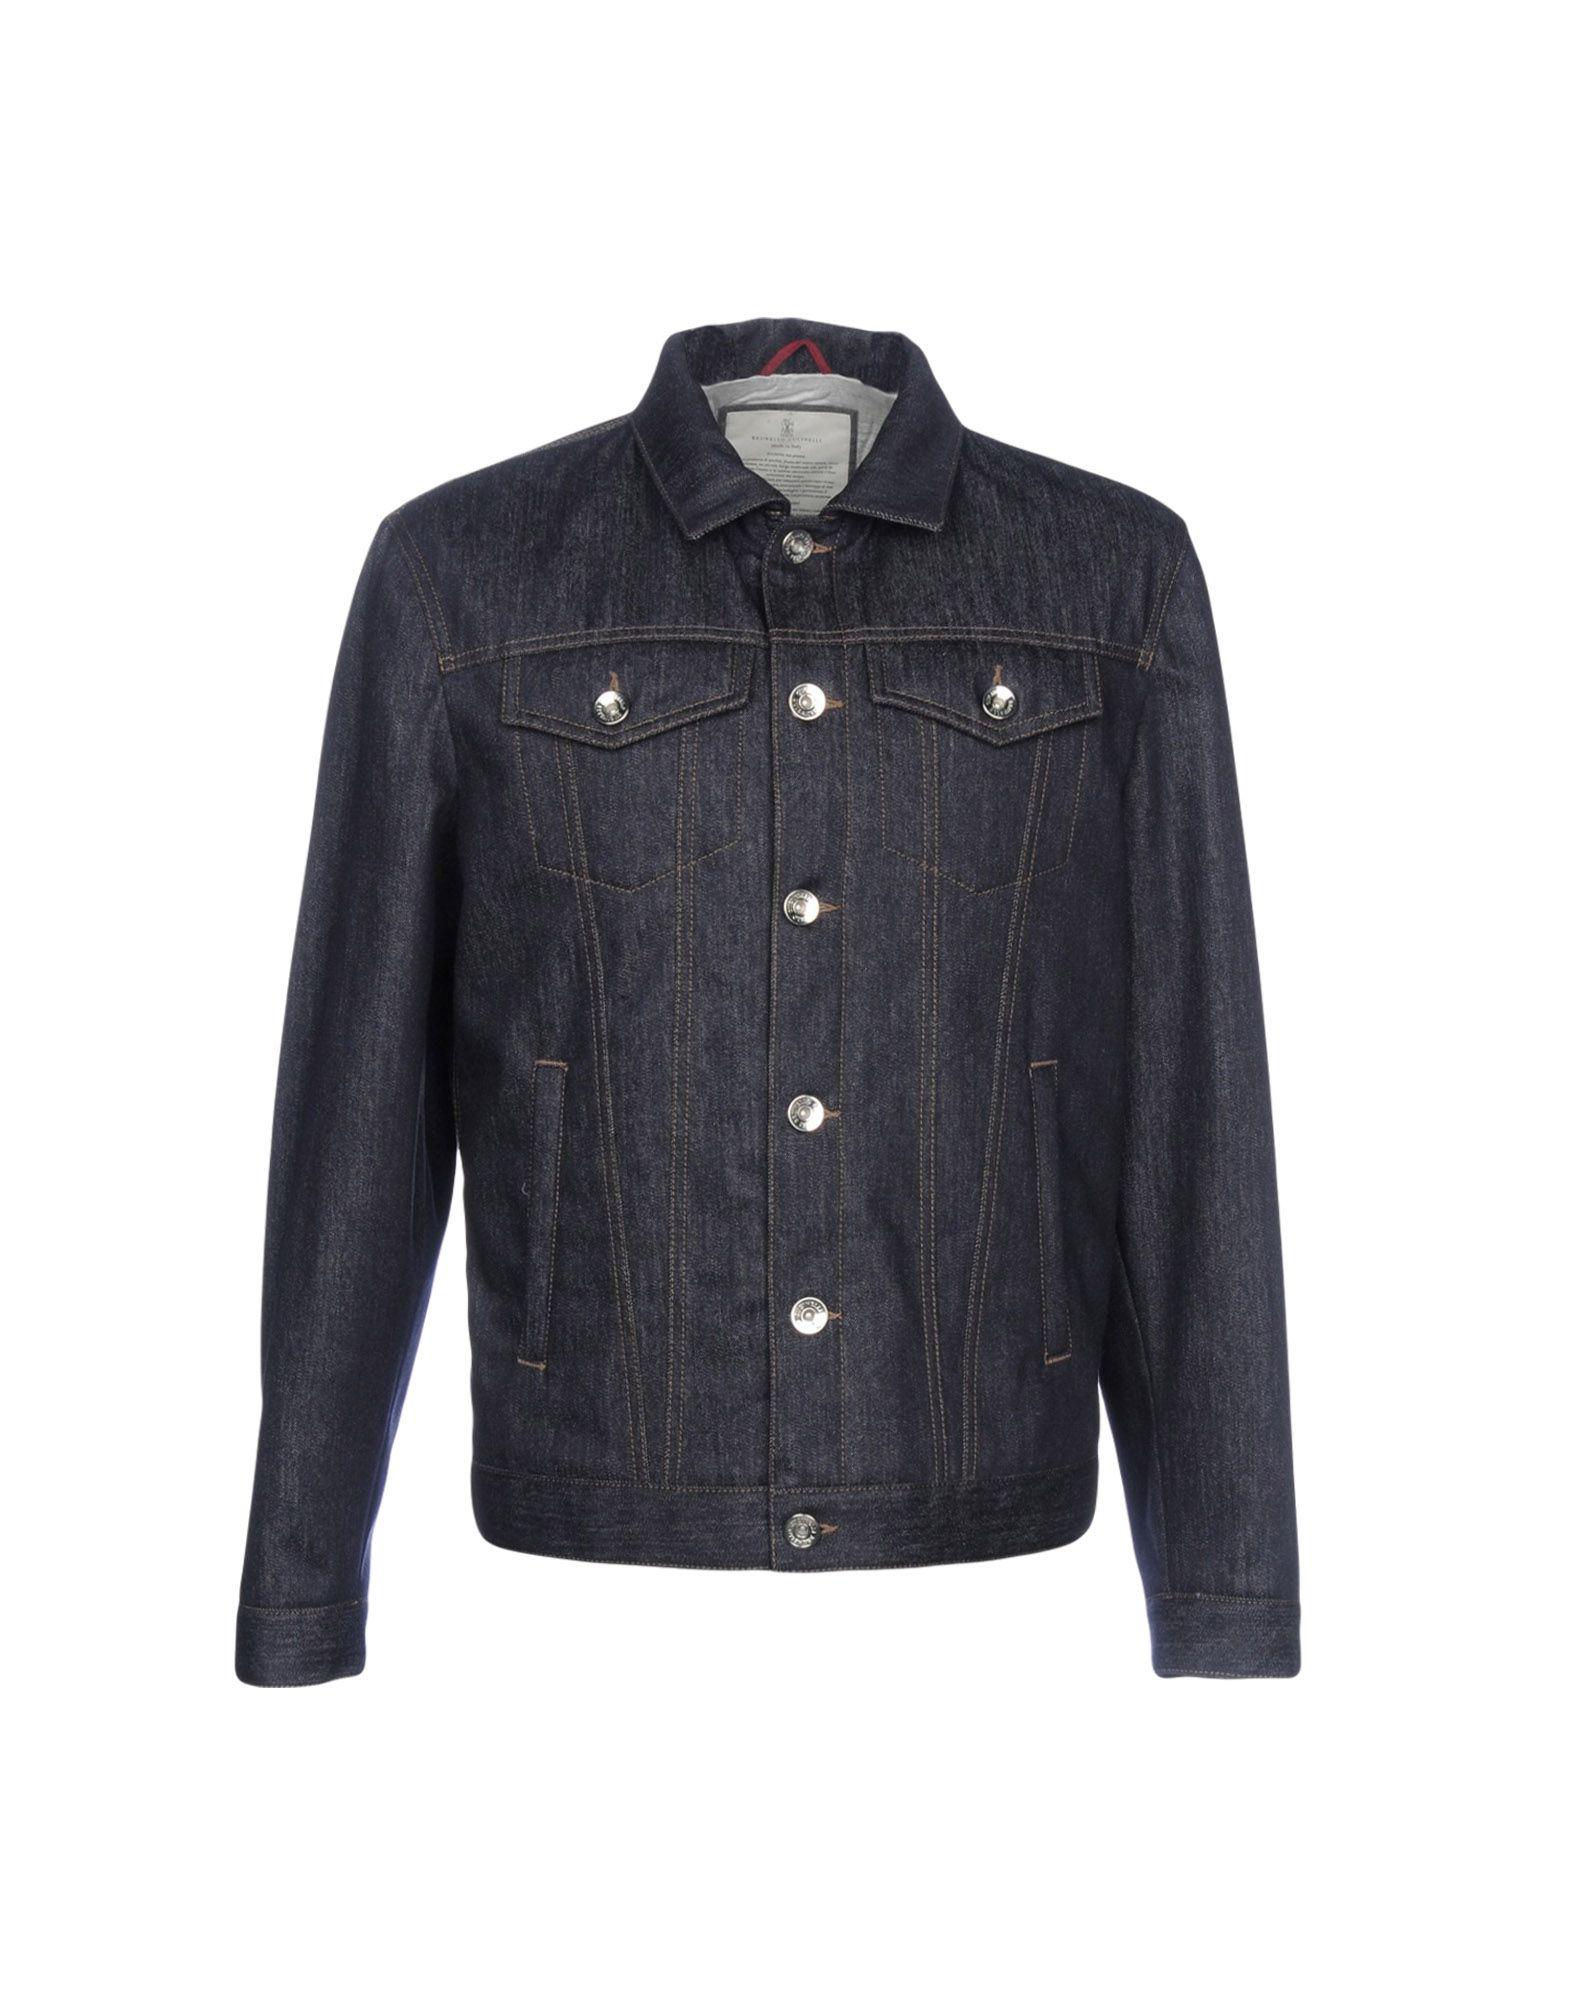 Giubbotto Jeans Cucinelli Brunello Cucinelli Jeans Uomo - 42684877XD 1bff24